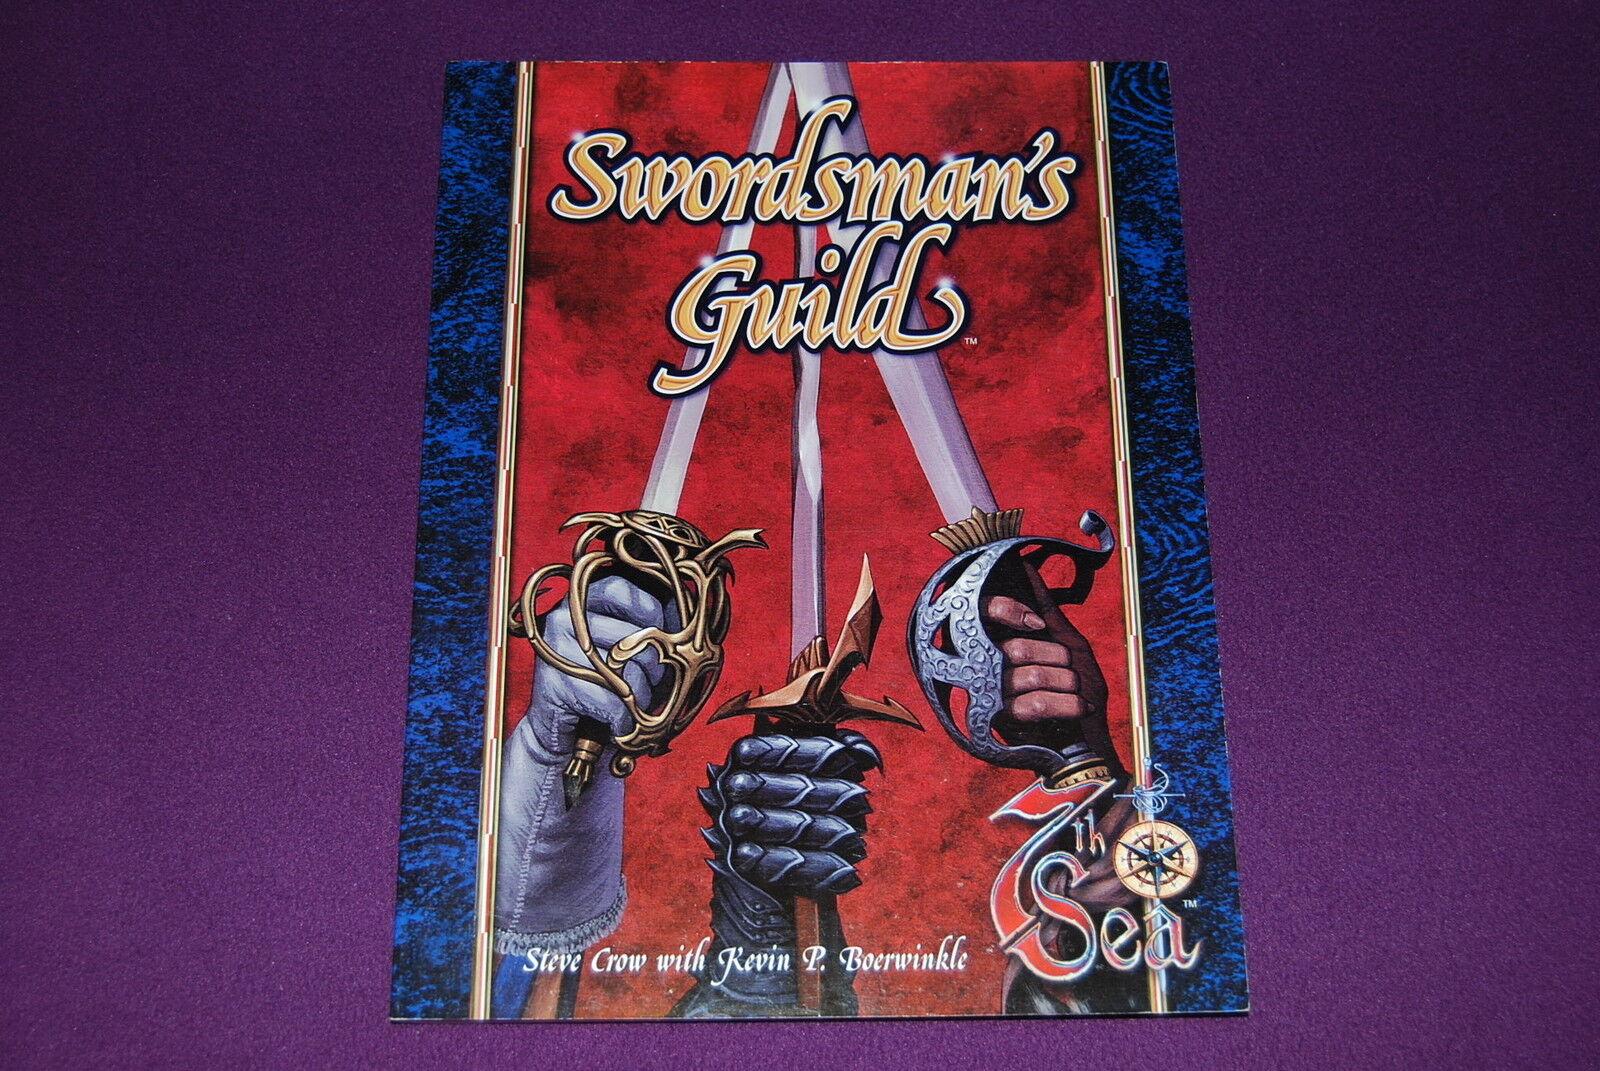 7TH SEA   SECRETS DE LA 7EME MER RPG JDR Jeu de Role - Swordsman's Guild